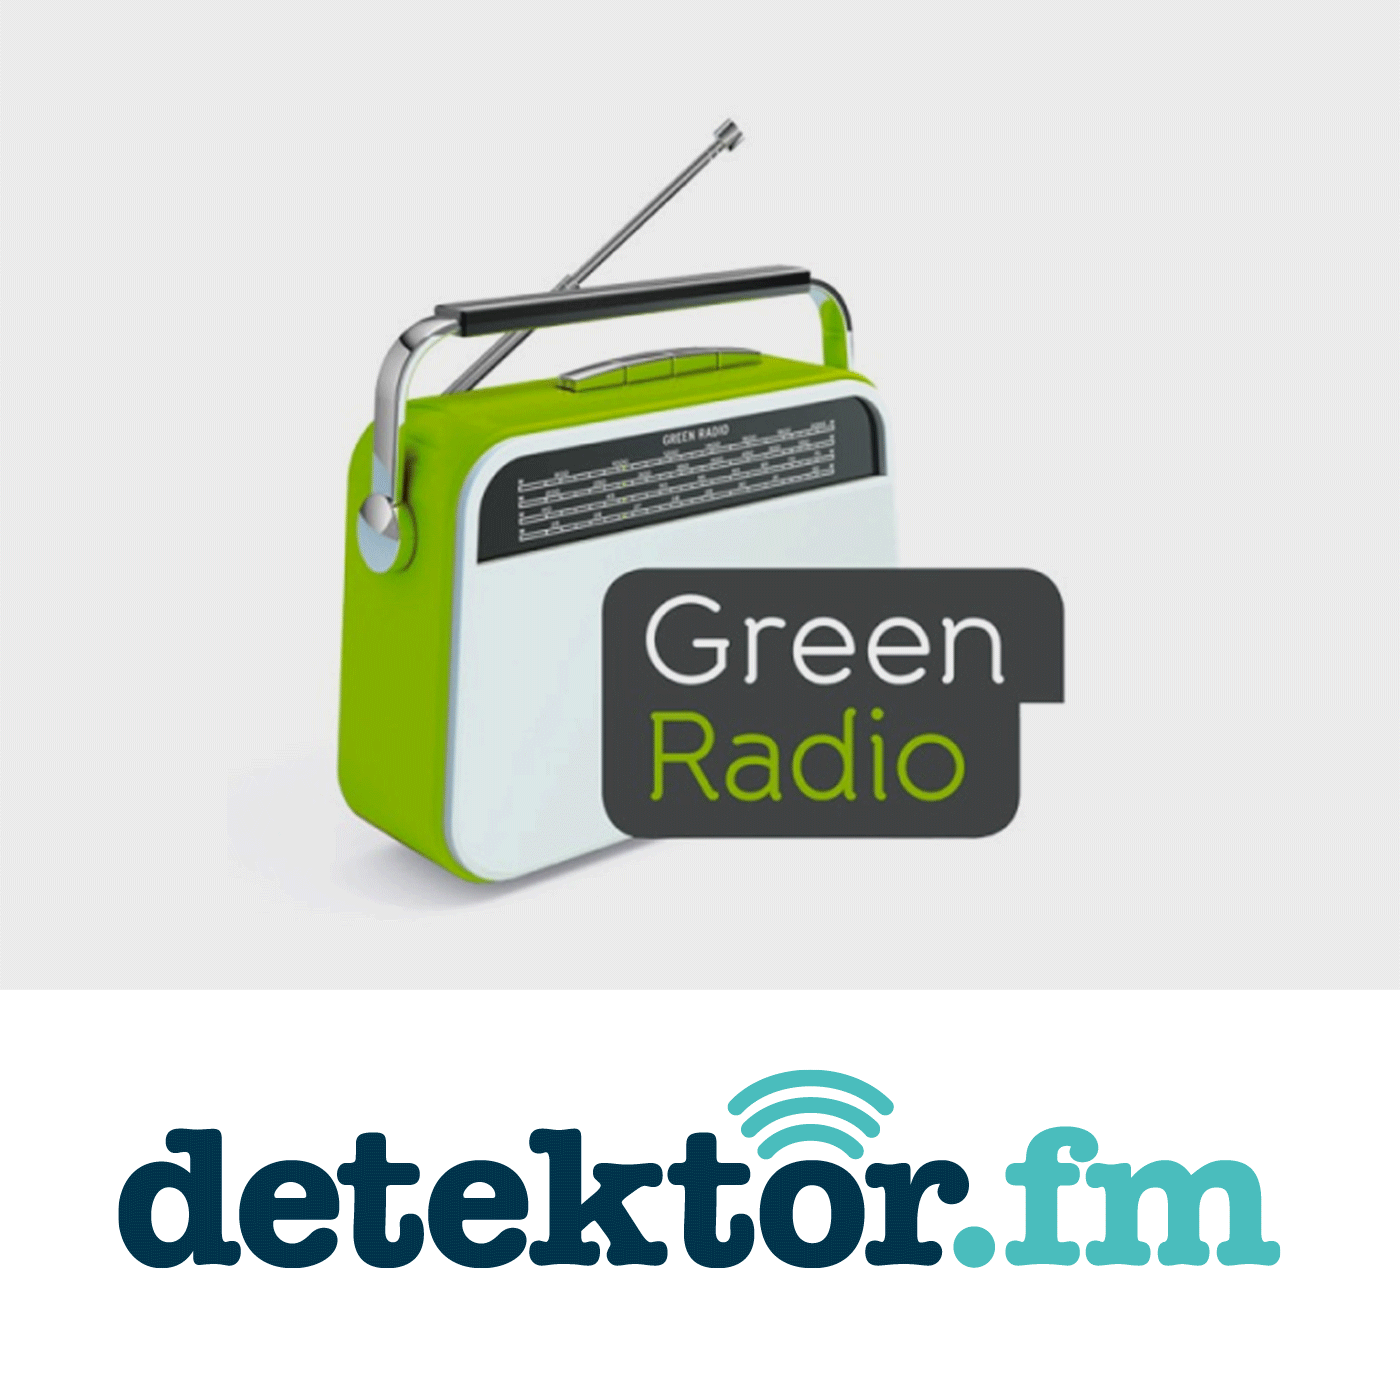 detektor.fm » Green Radio